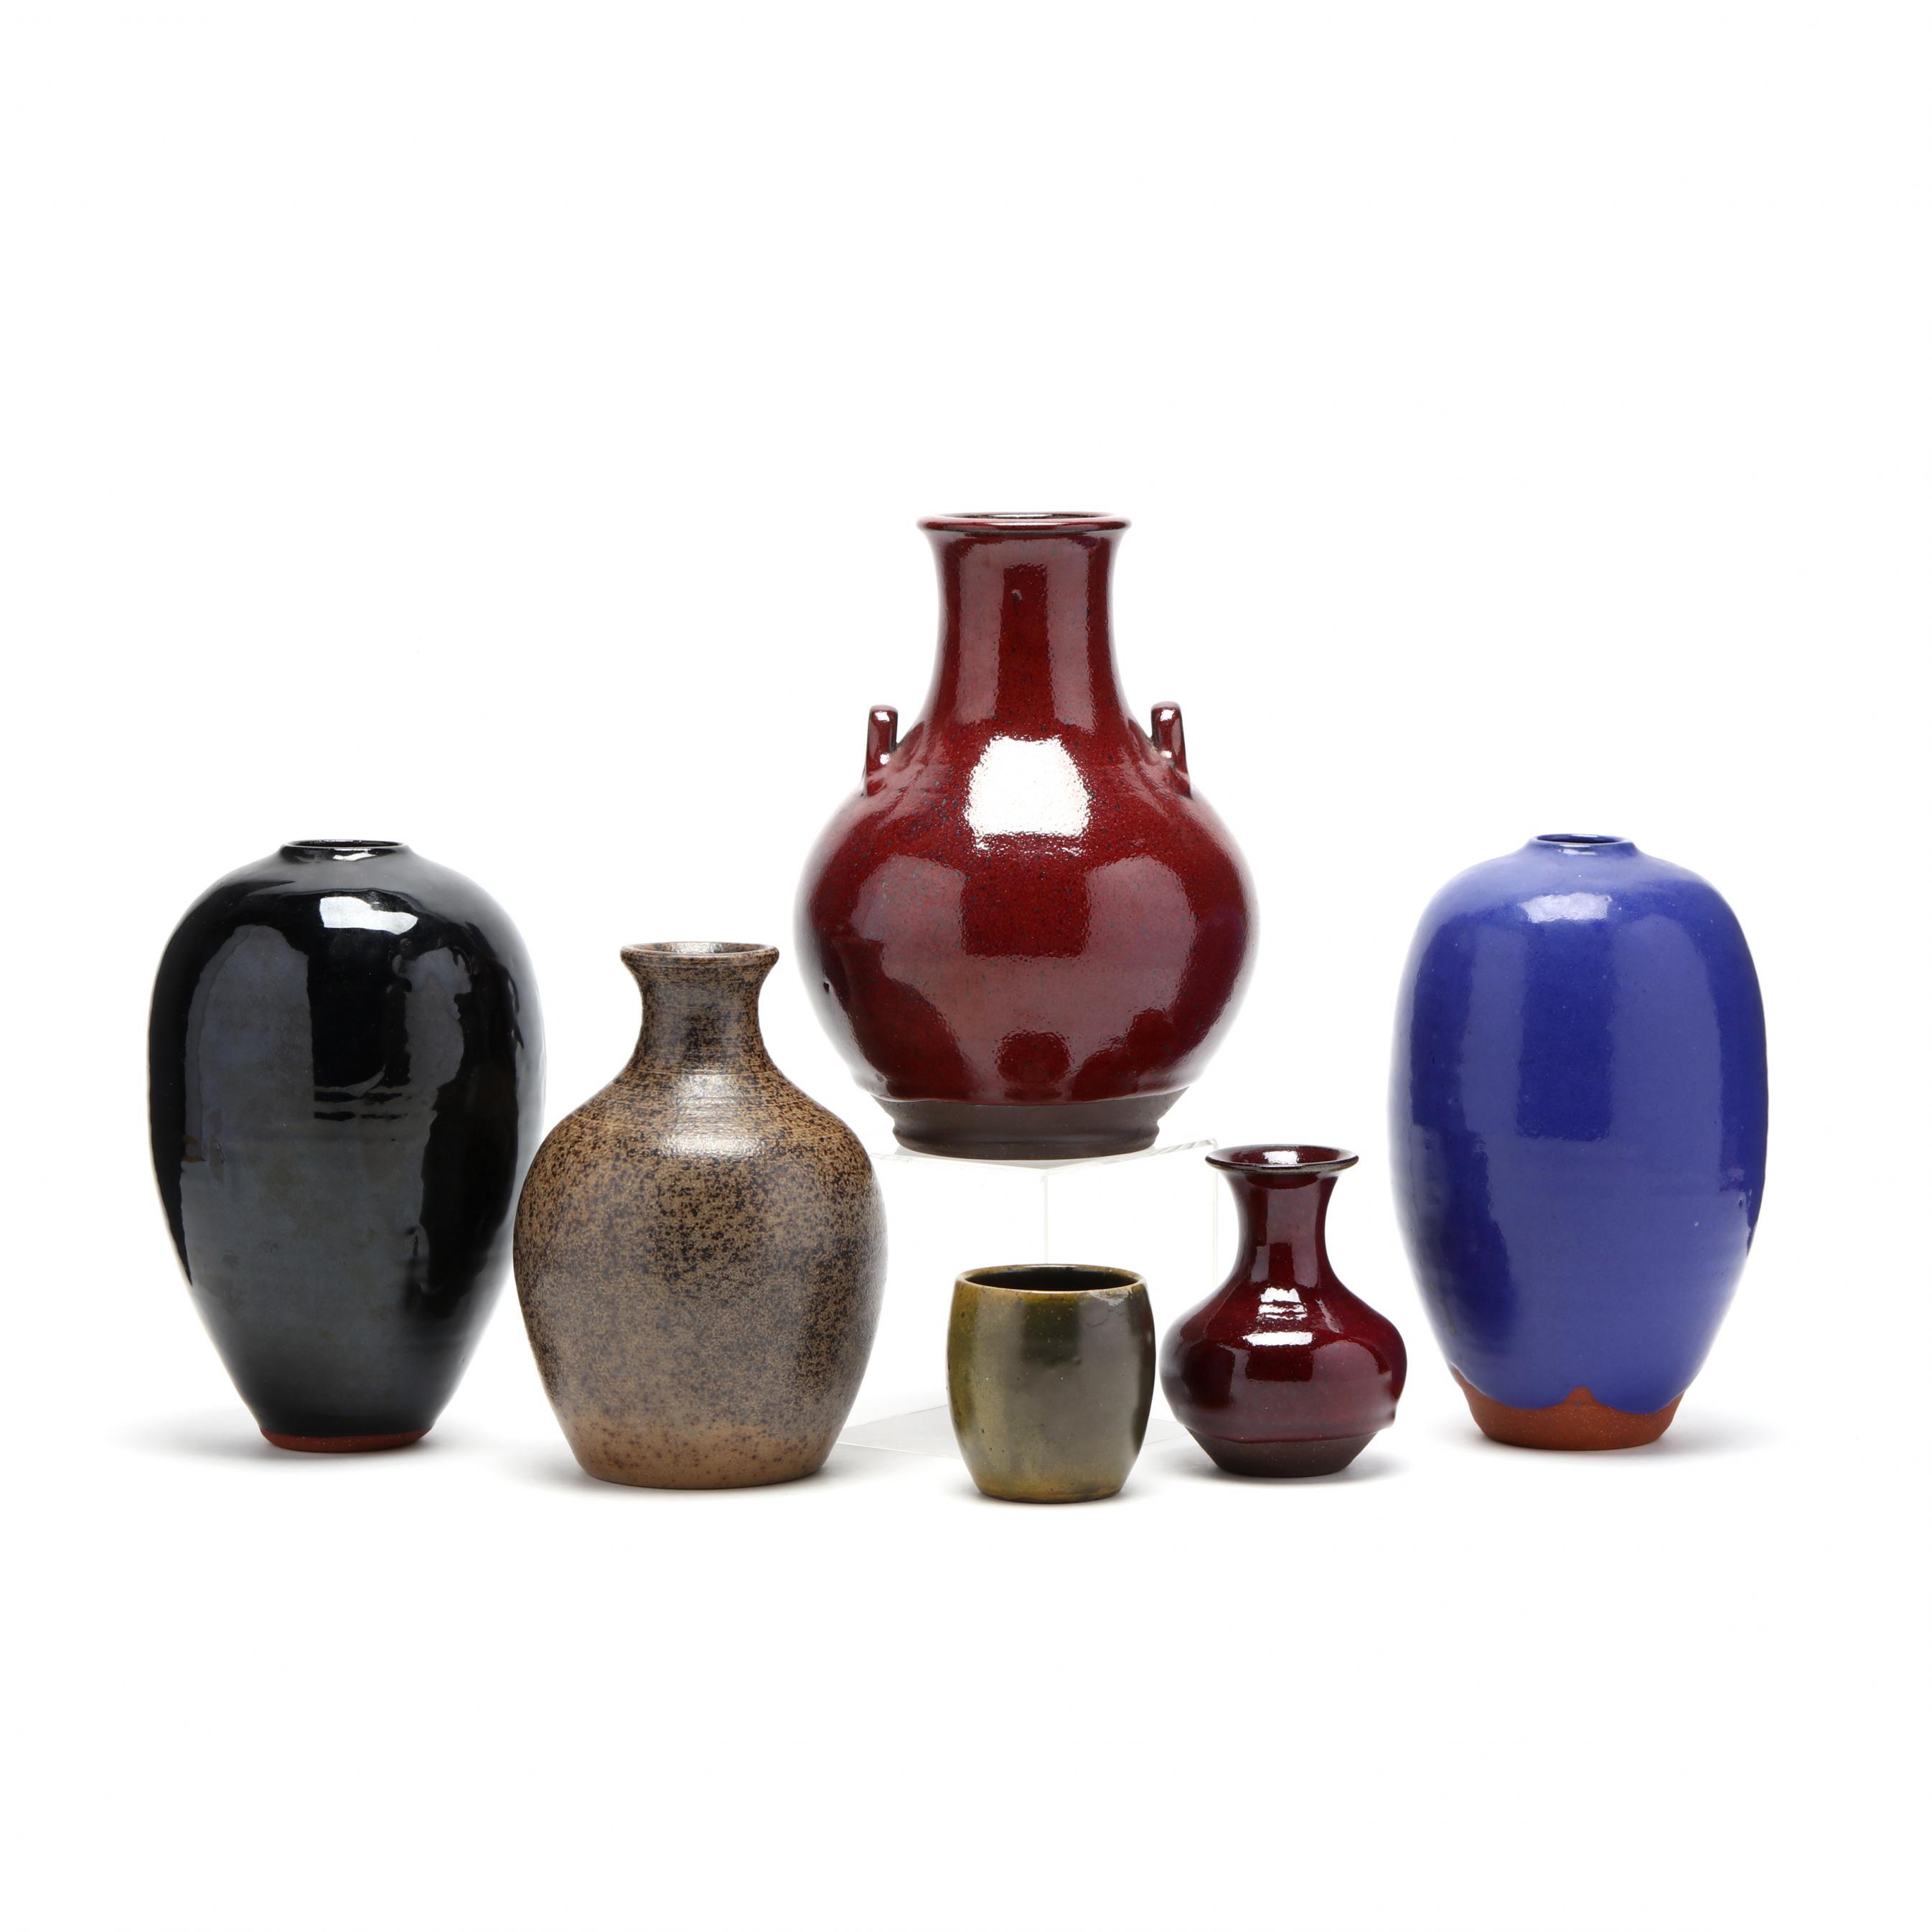 nc-art-pottery-jugtown-area-owens-family-potters